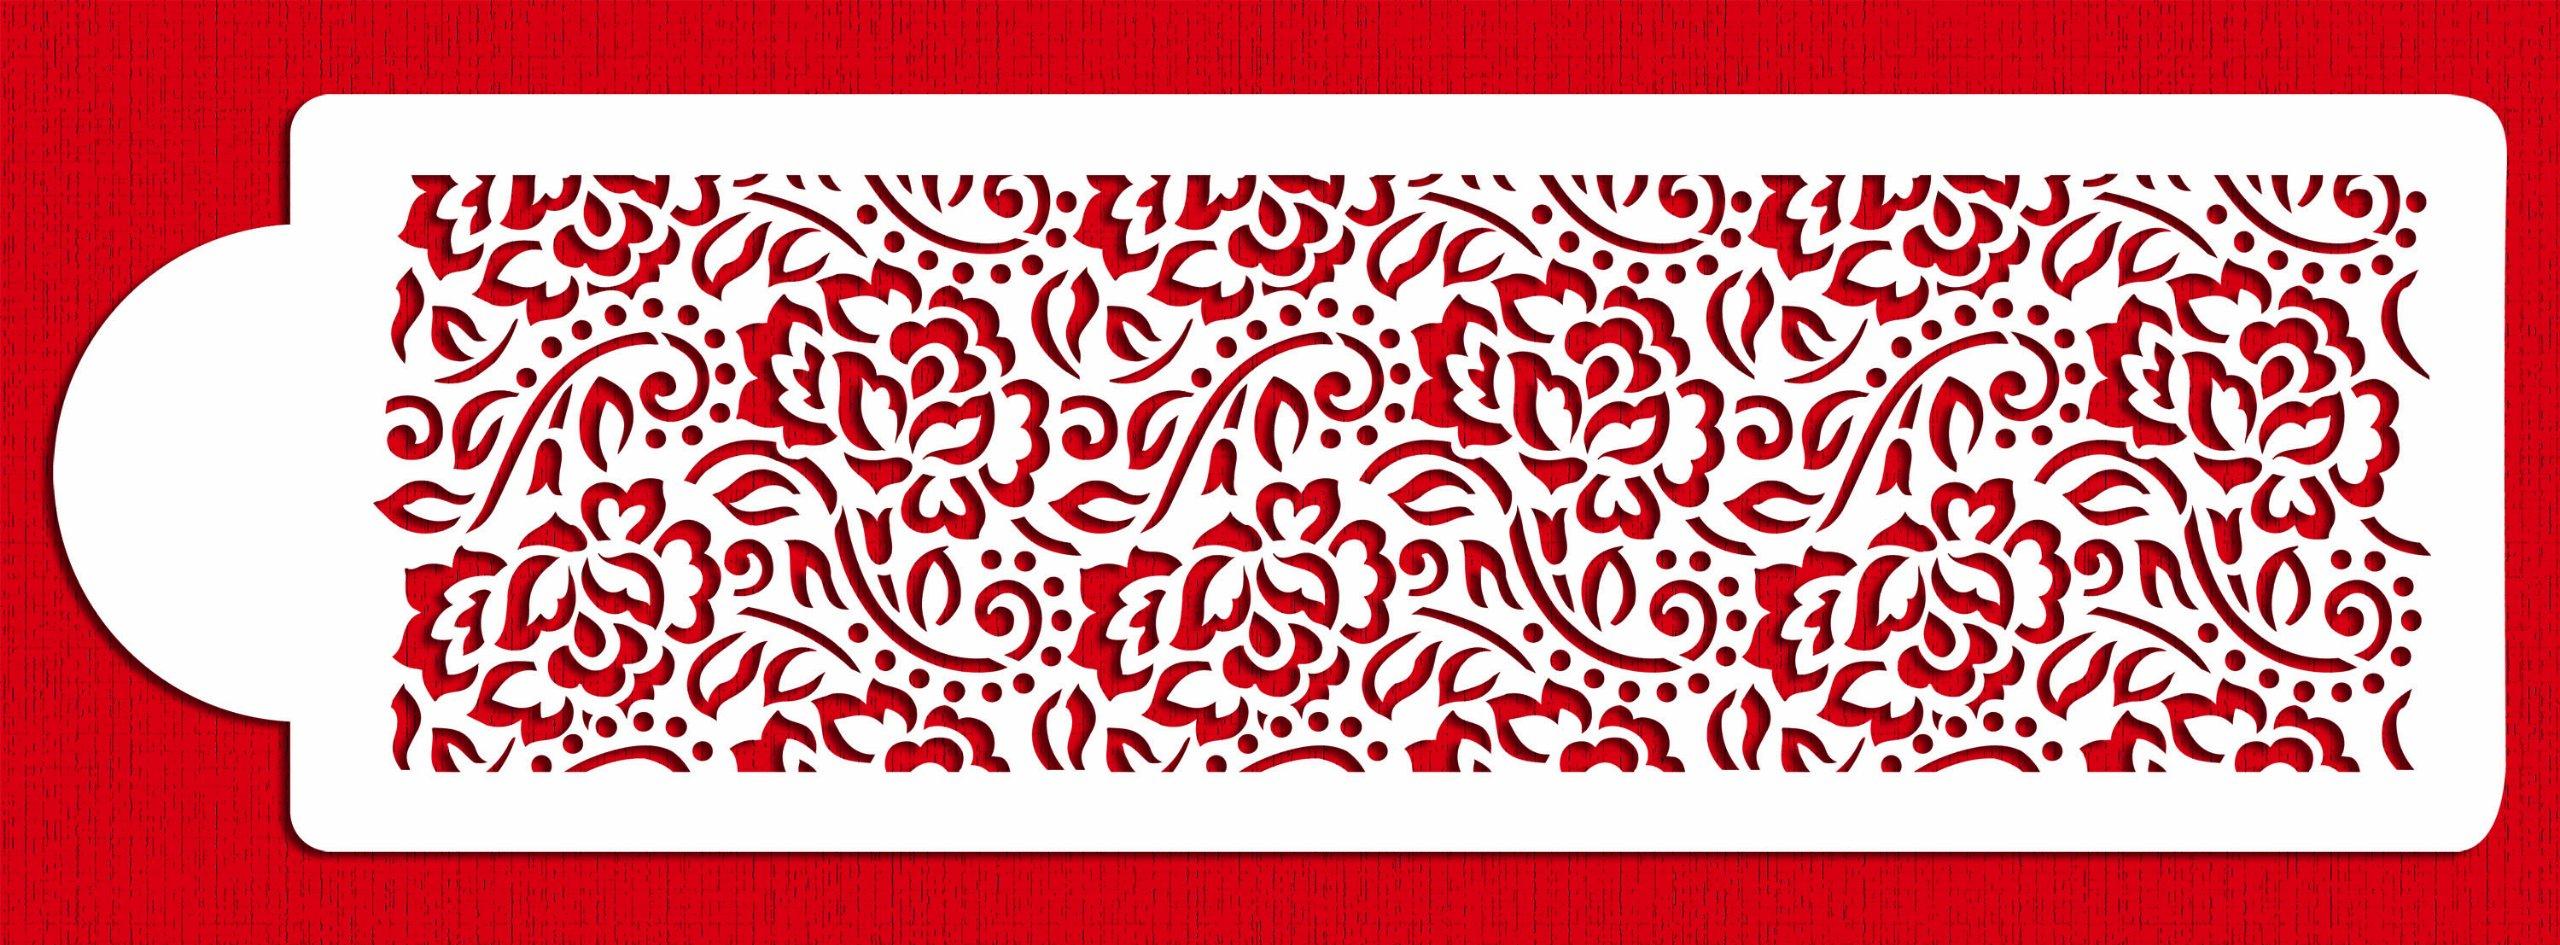 Designer Stencils C869 Chantilly Lace 1 Cake Side Stencil, Beige/Semi-Transparent